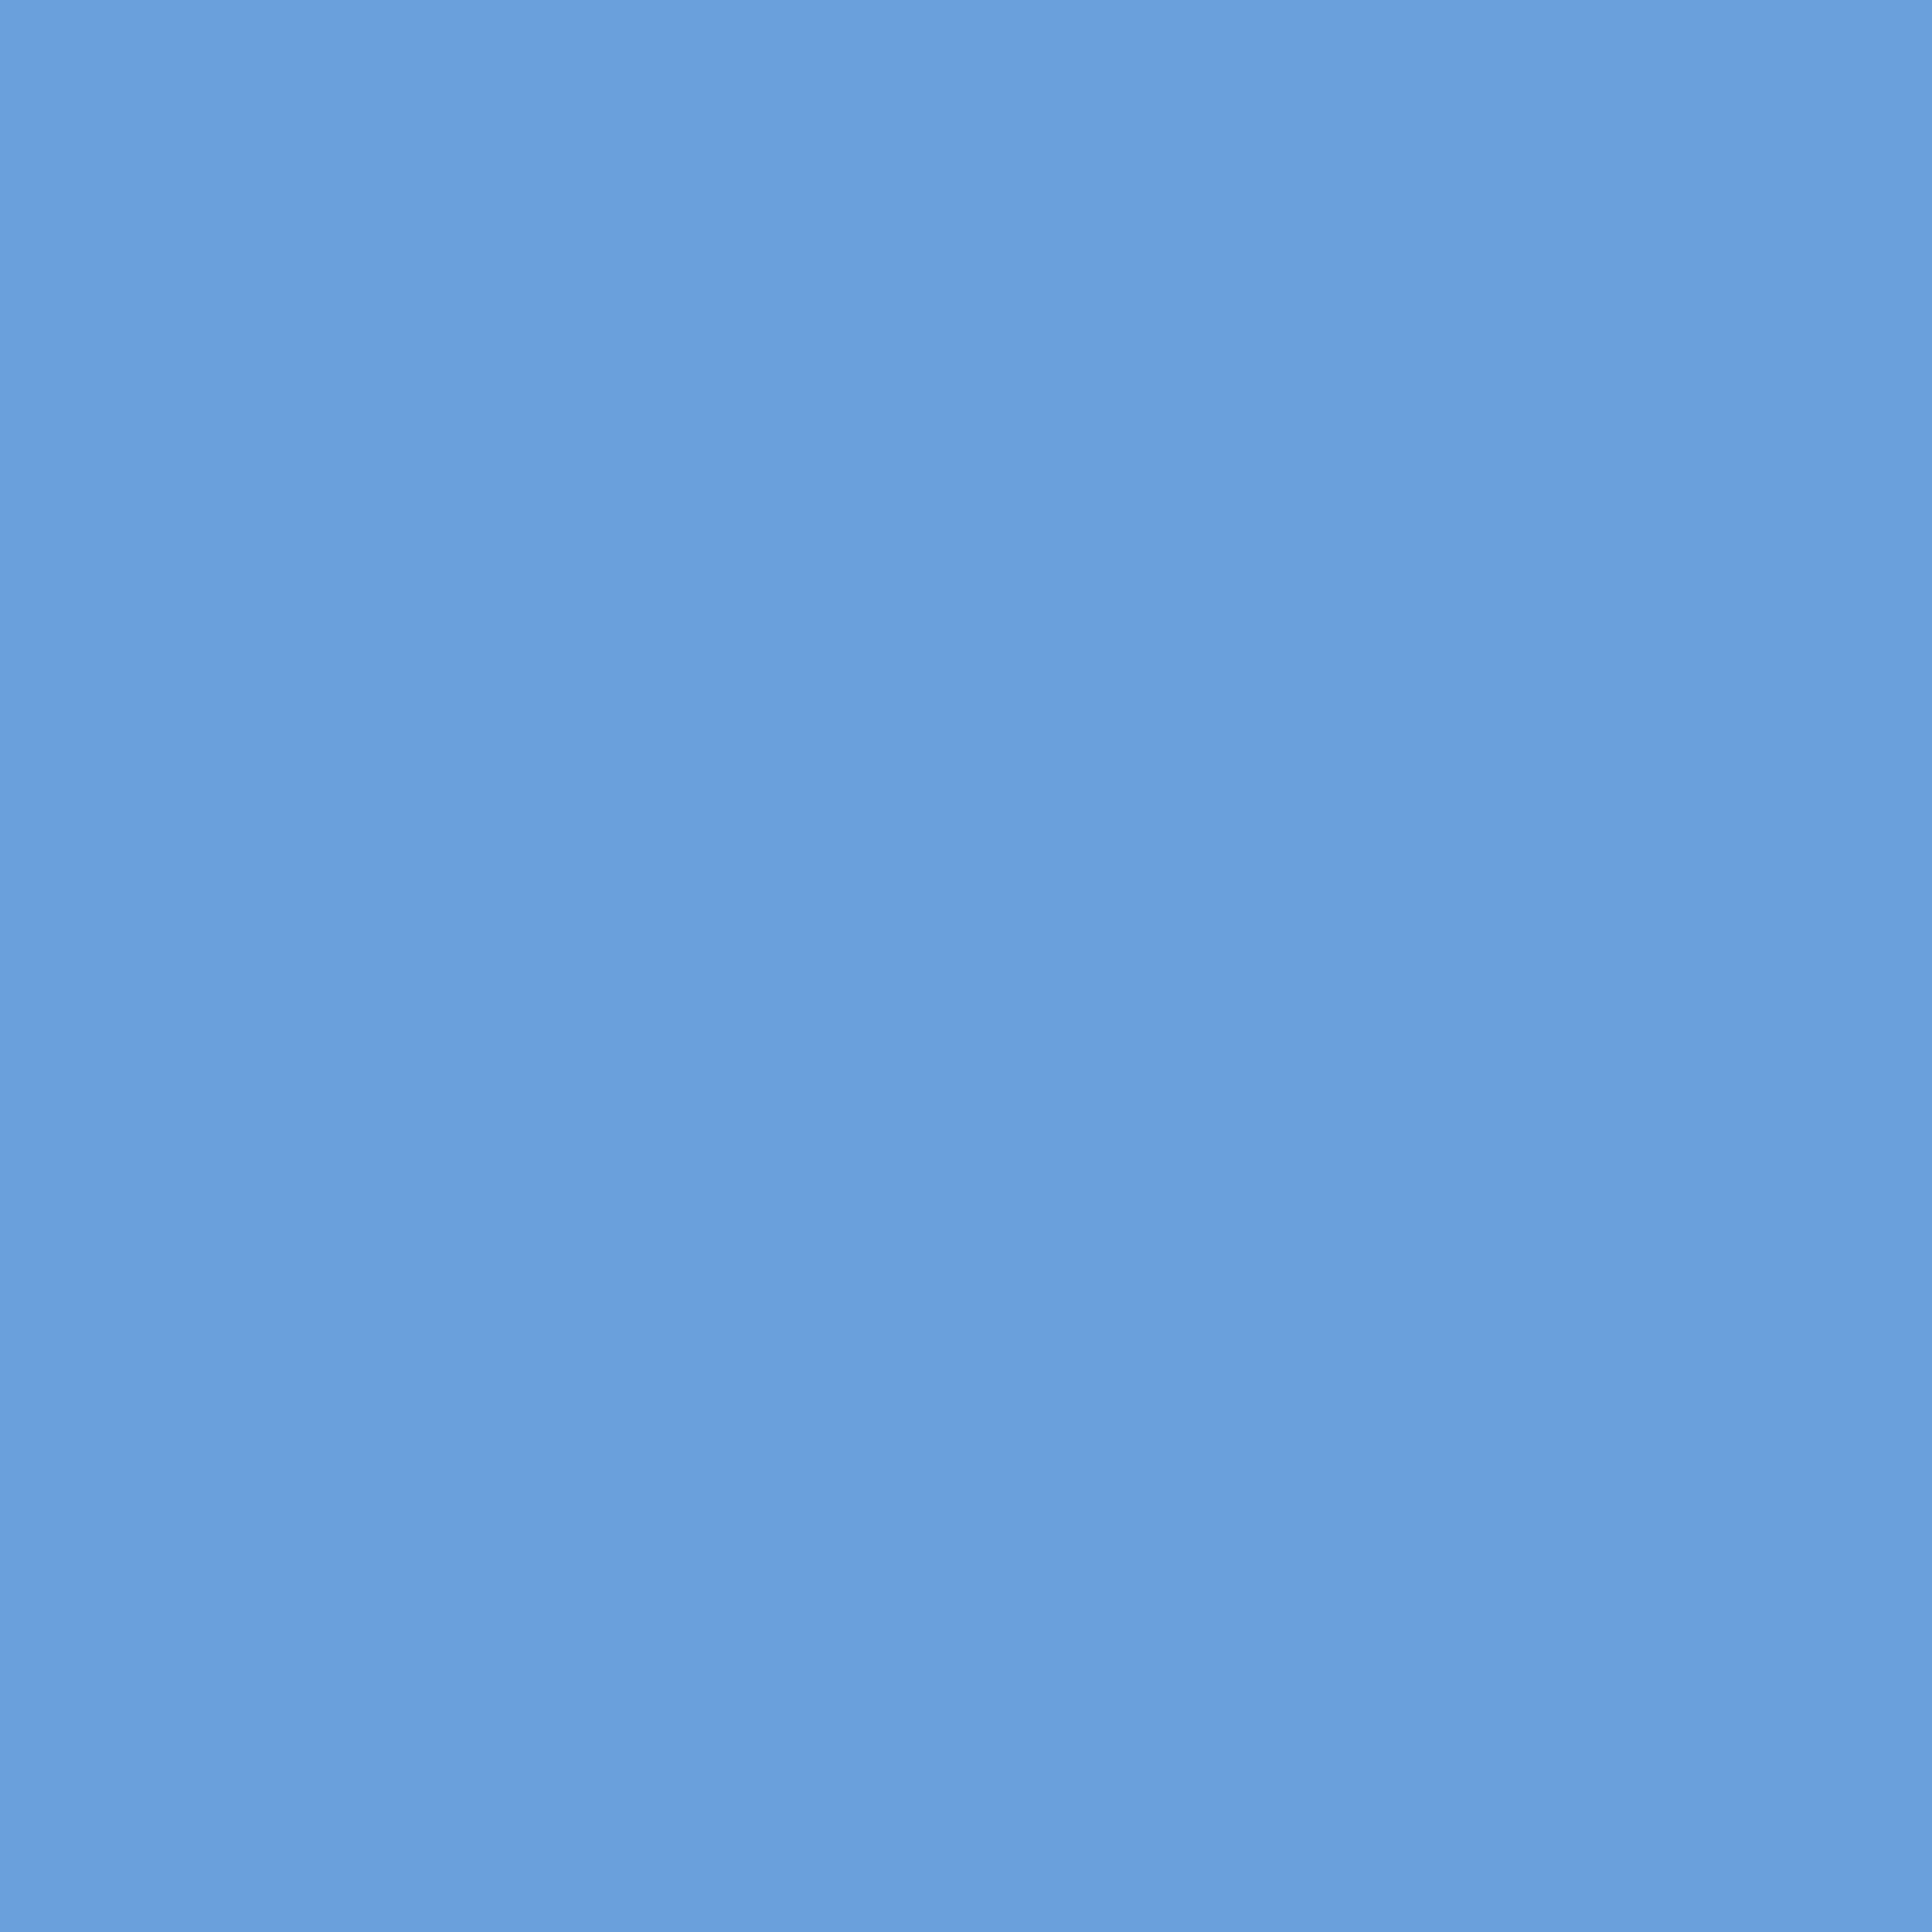 2732x2732 Little Boy Blue Solid Color Background